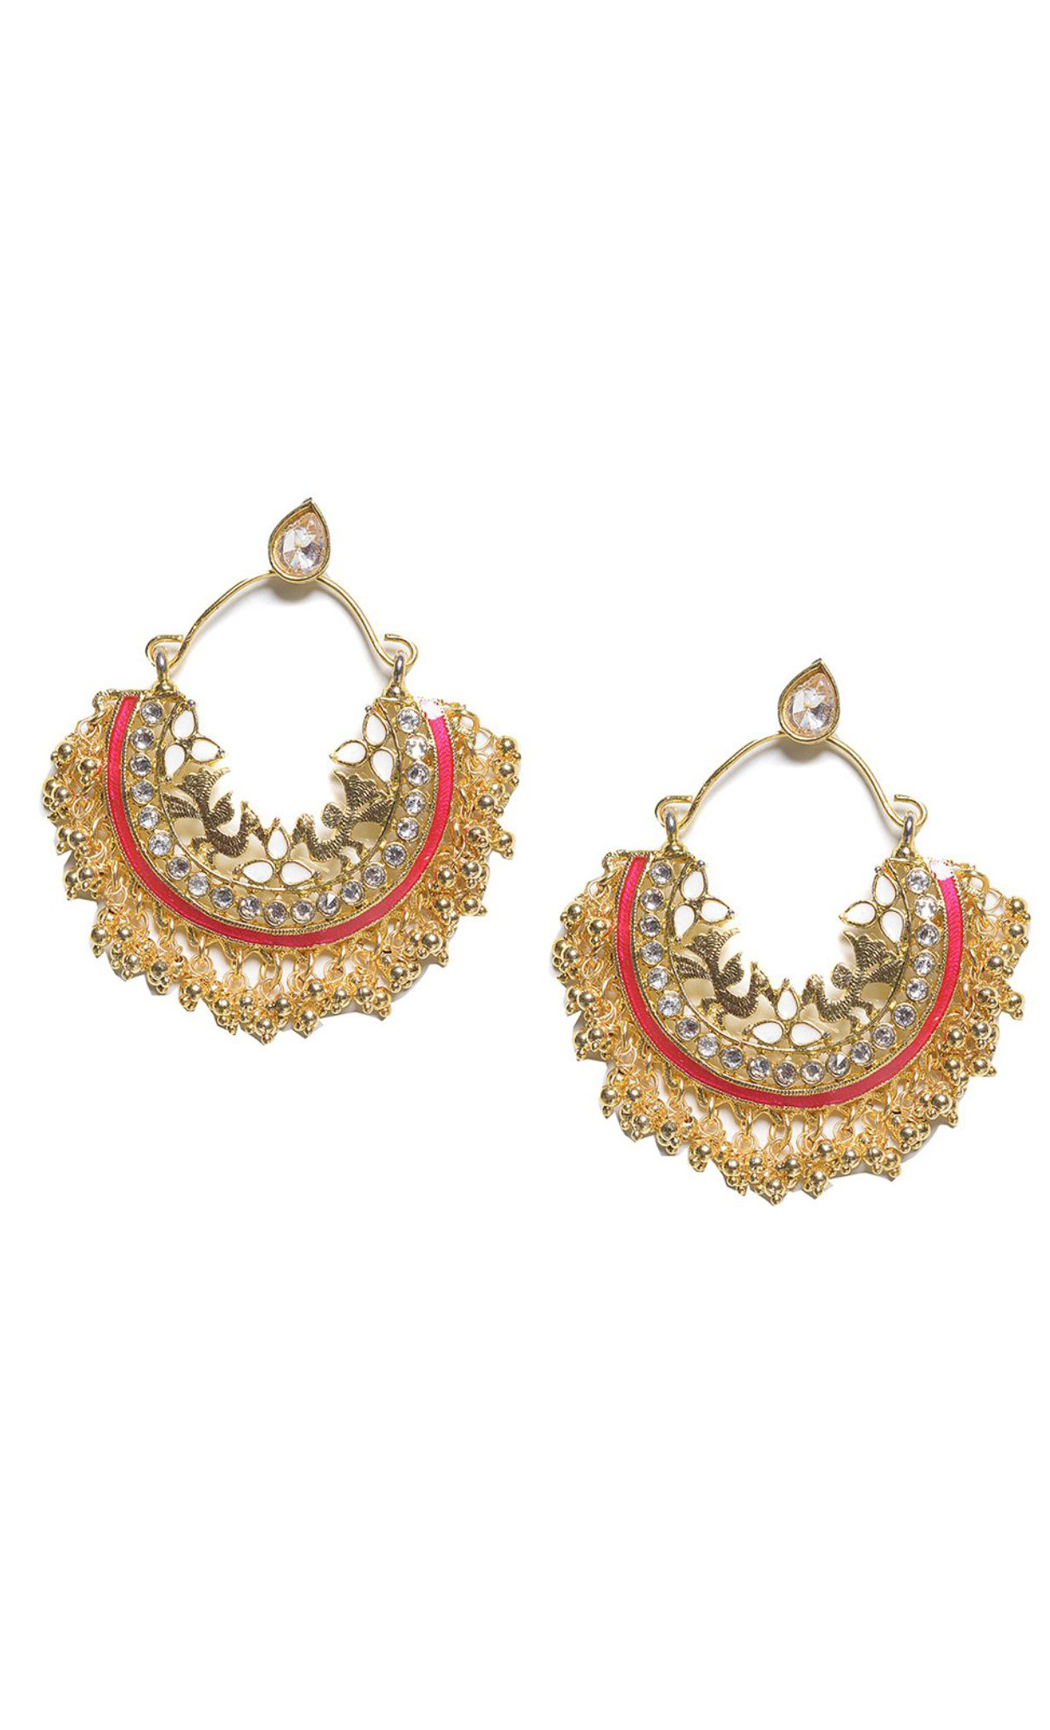 Fuschia Multi Crescent Chandbali Earrings - Shop Online